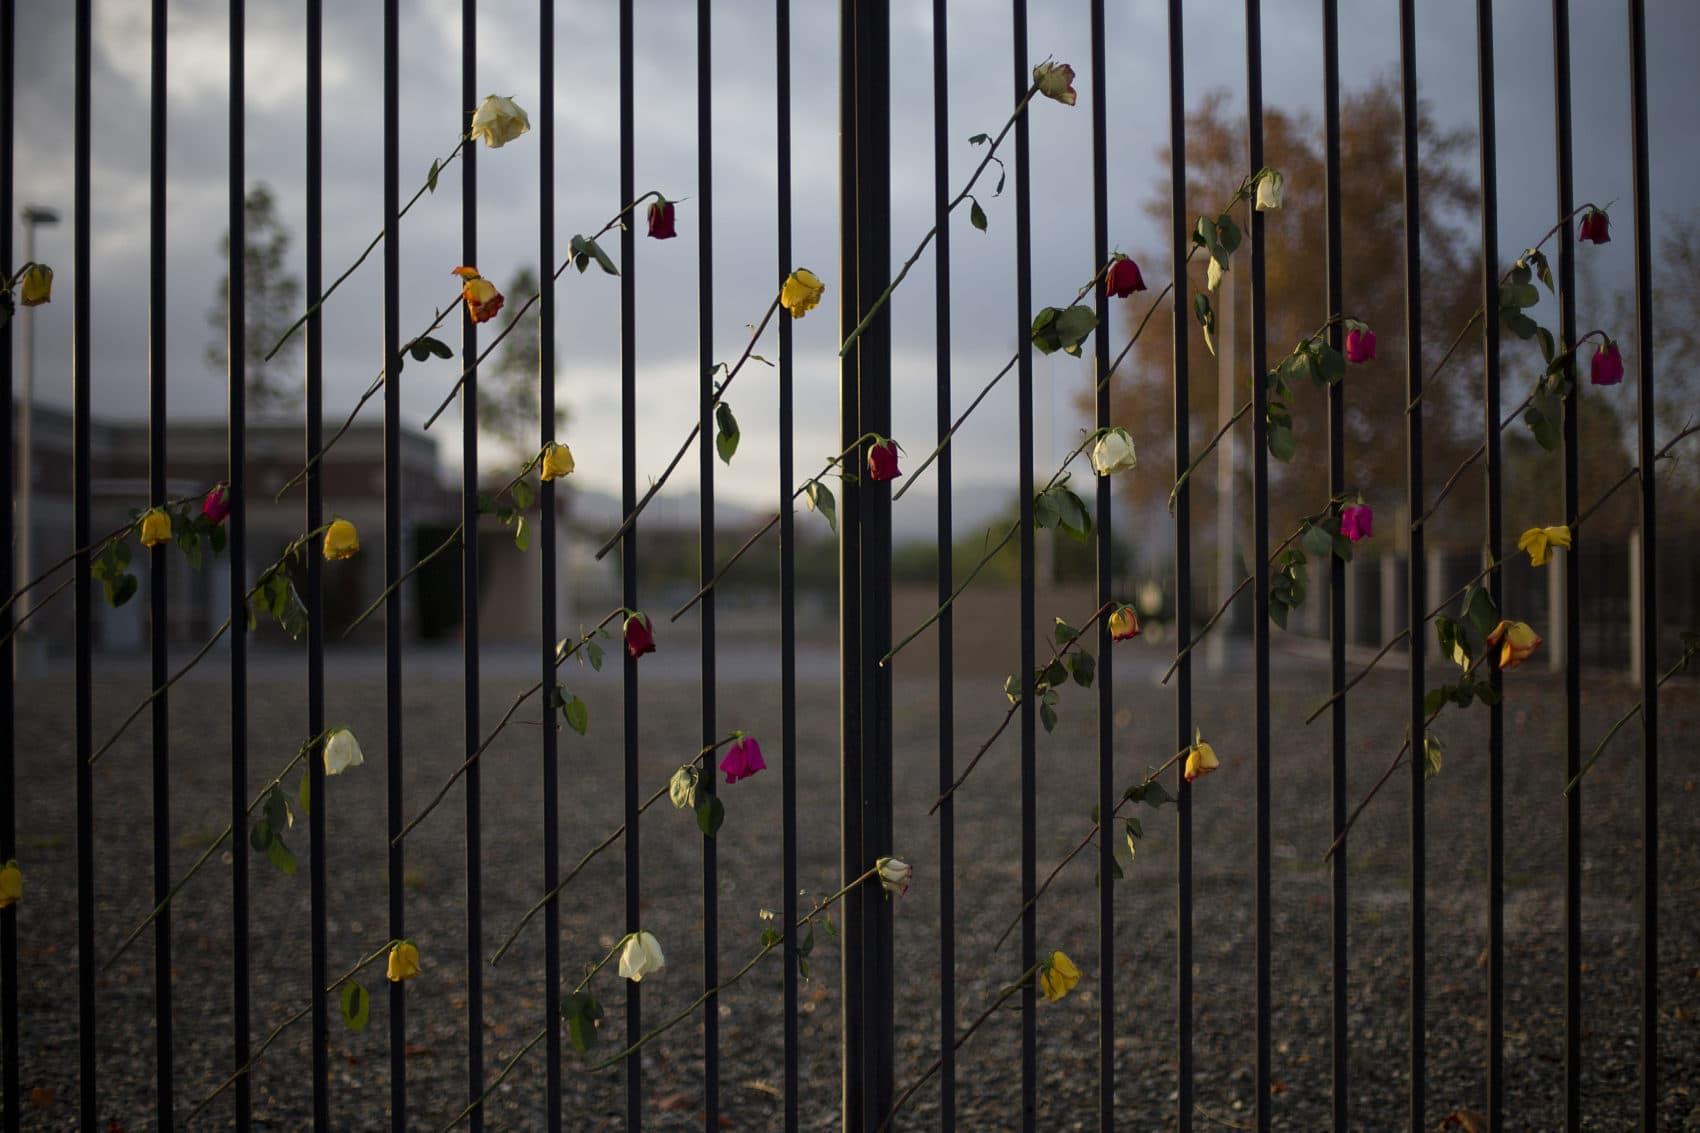 Roses adorn a makeshift memorial near the Inland Regional Center, Friday, Dec. 11, 2015, in San Bernardino, Calif. (AP Photo/Jae C. Hong)